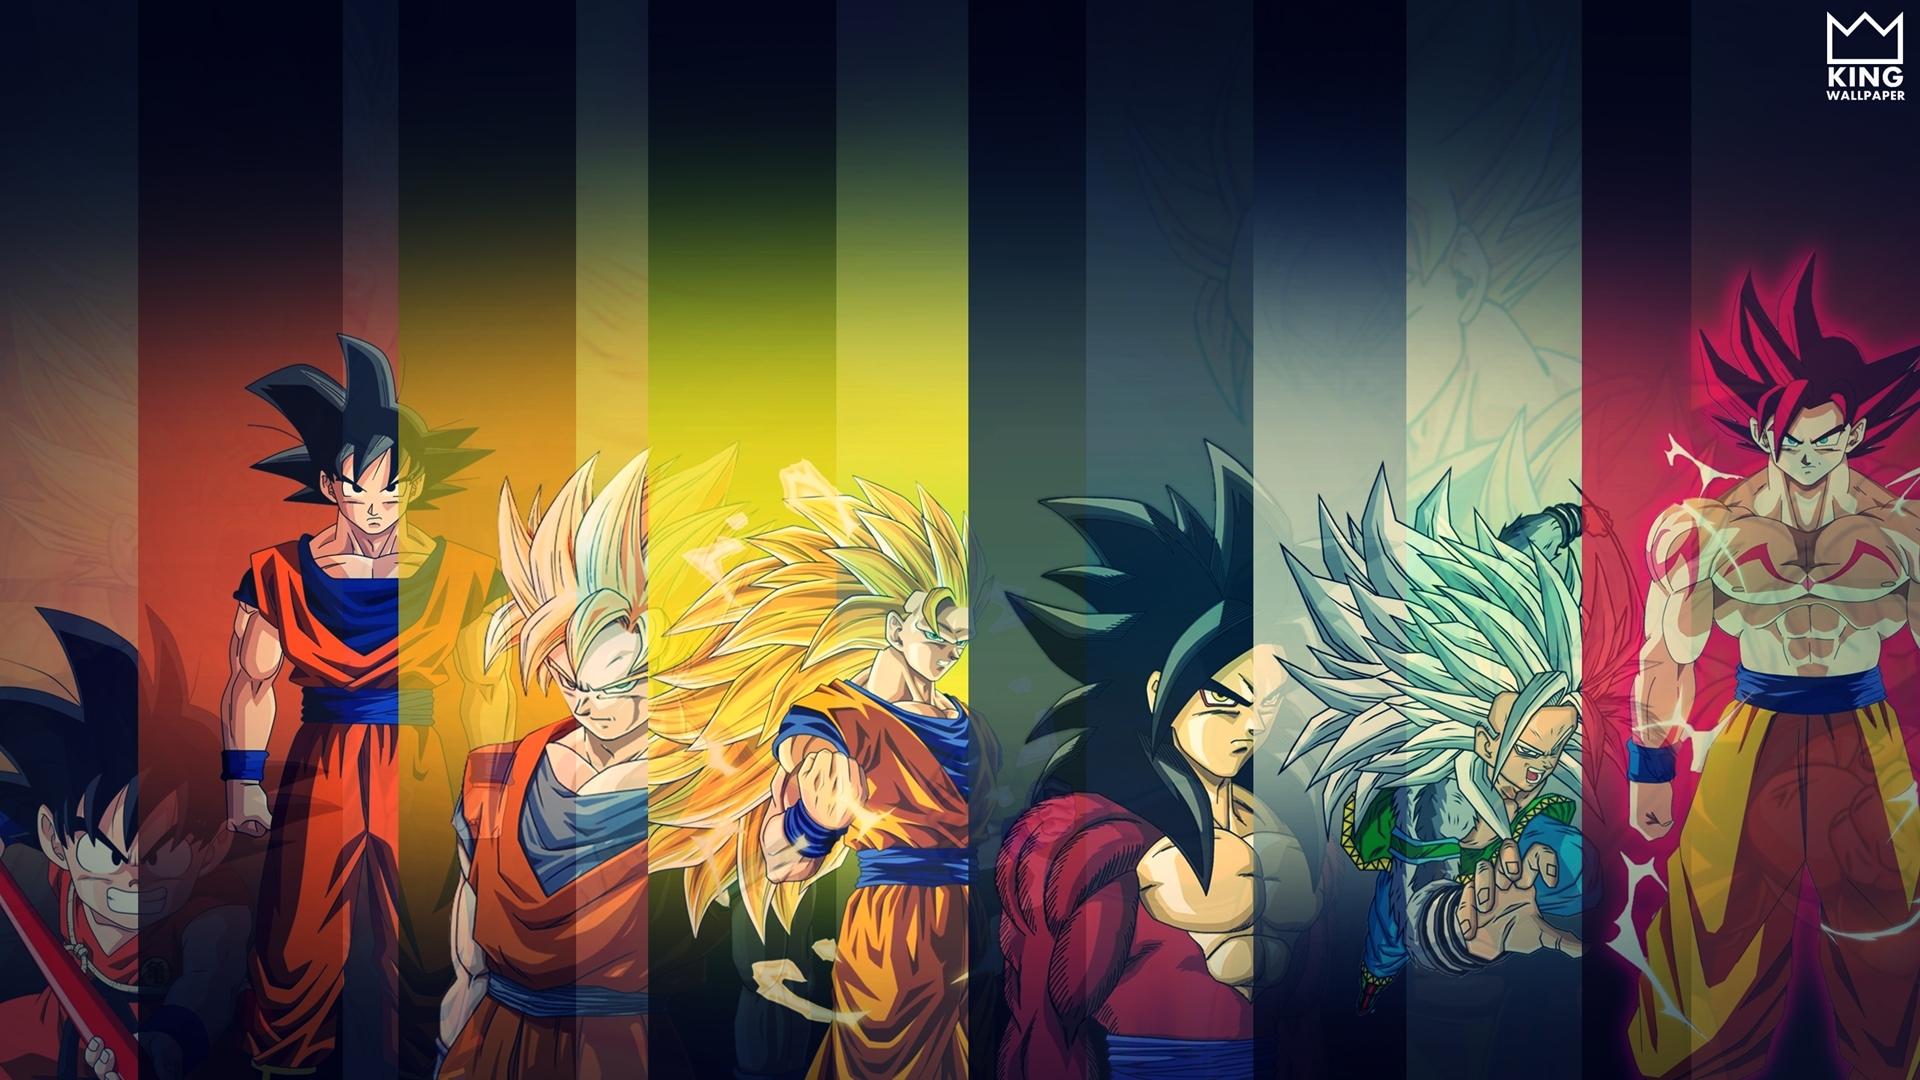 Best-Goku-hd-for-PC-Dragon-Ball-Z-wallpaper-wp3401365